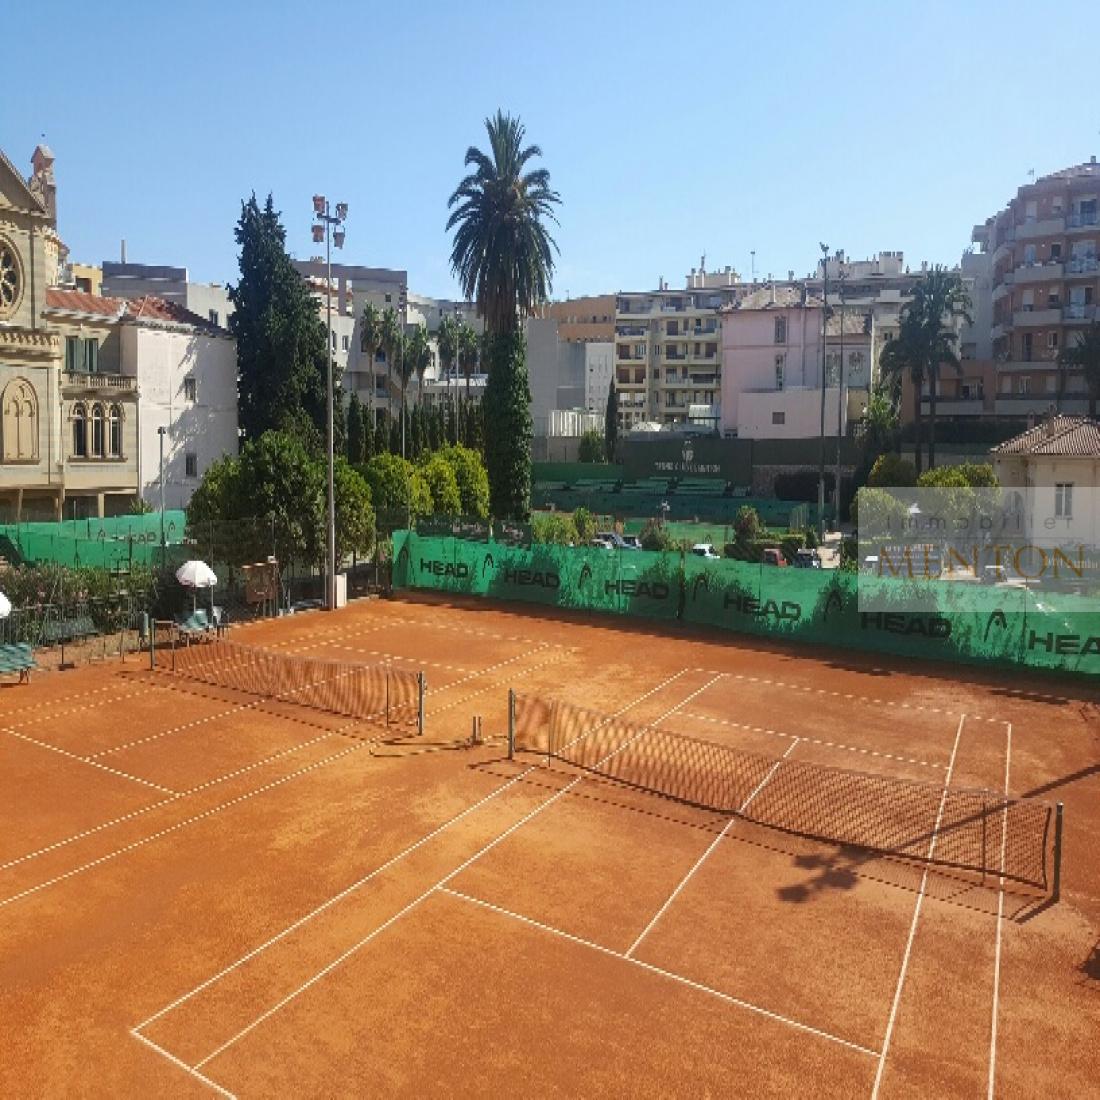 proche des tennis